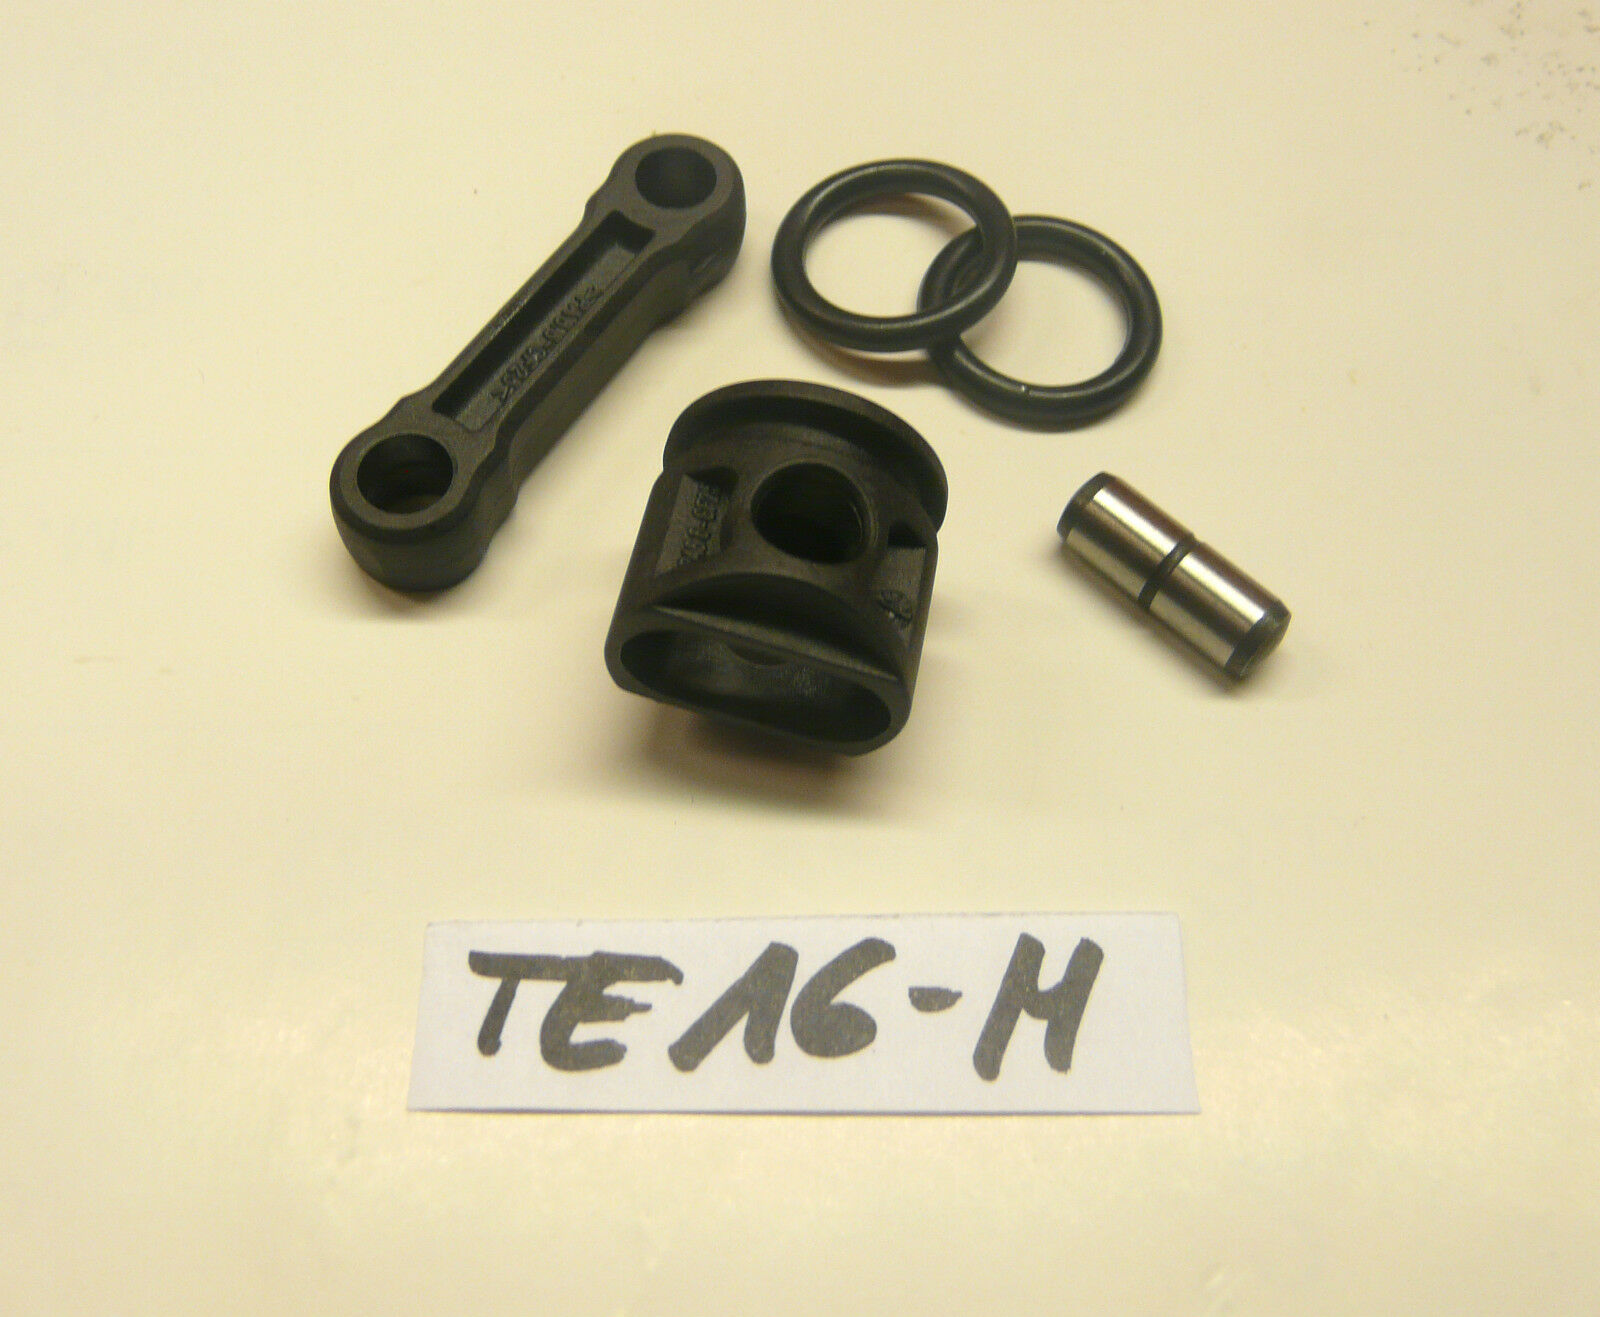 Hilti TE 16-M  ,Pleuel, Erregerkolben, Zylinderstift & 2 O-Ringe  (2620)